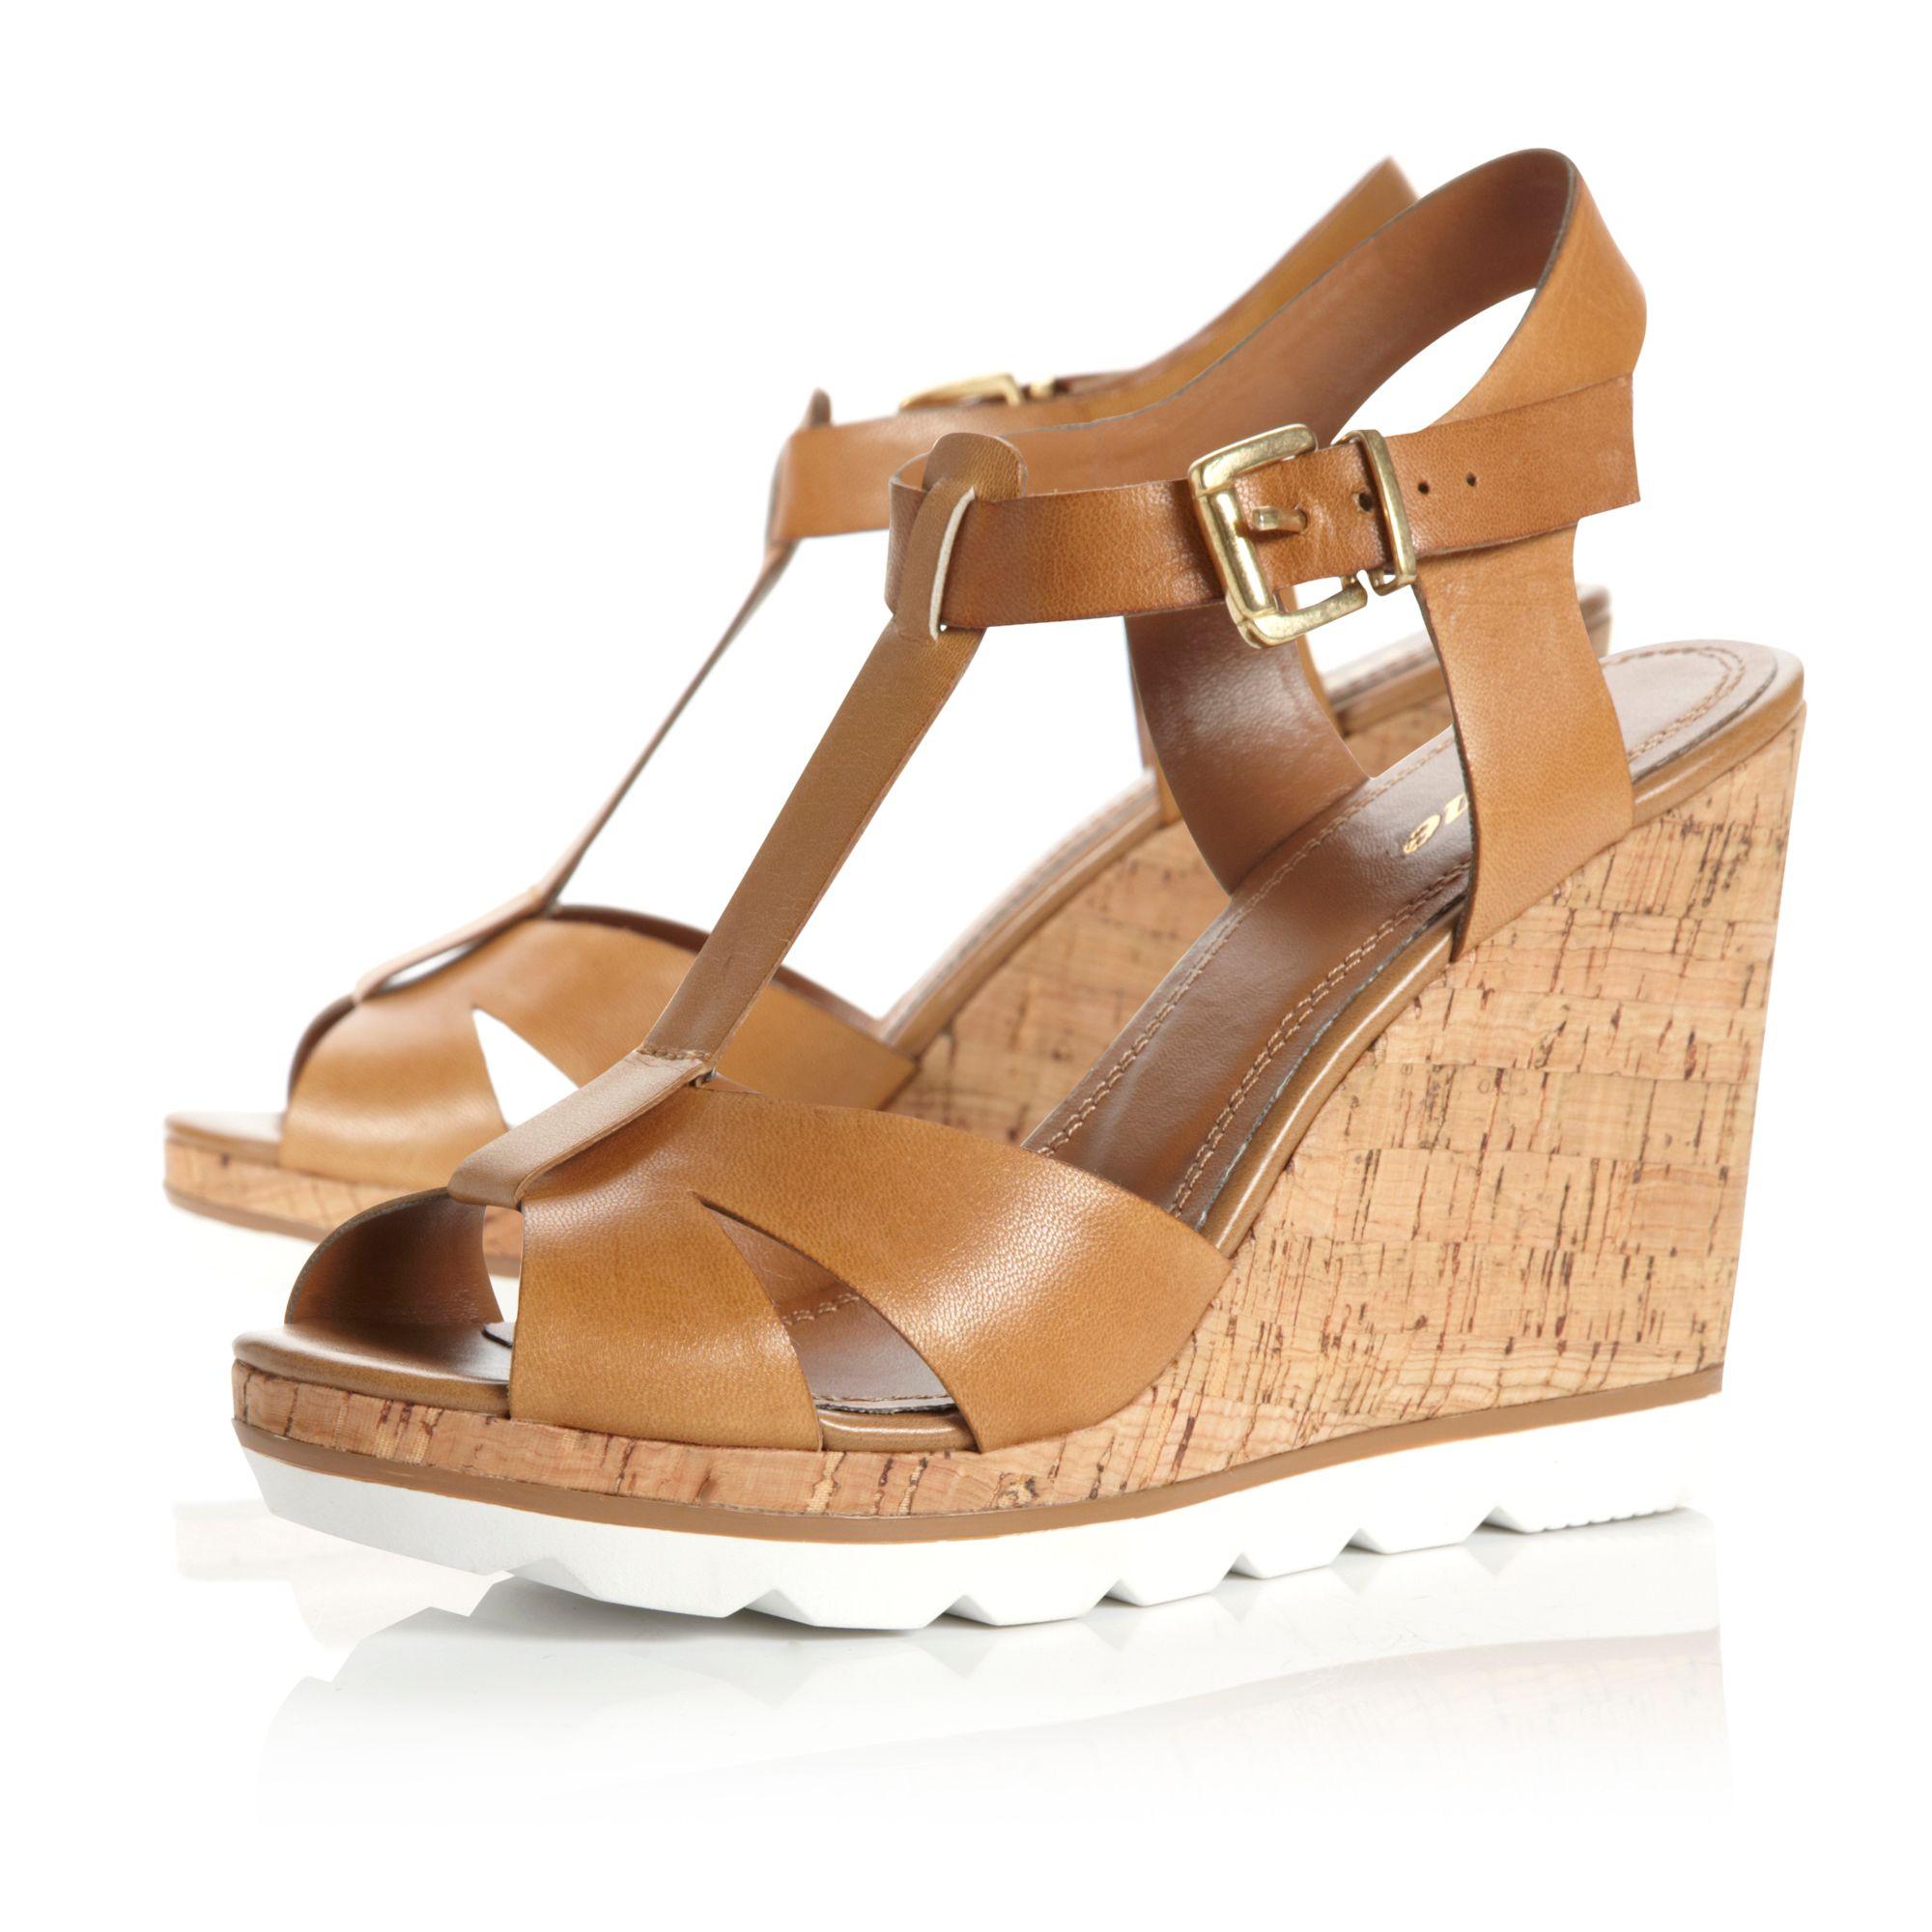 dune giraffe tbar wedge shoes in brown lyst